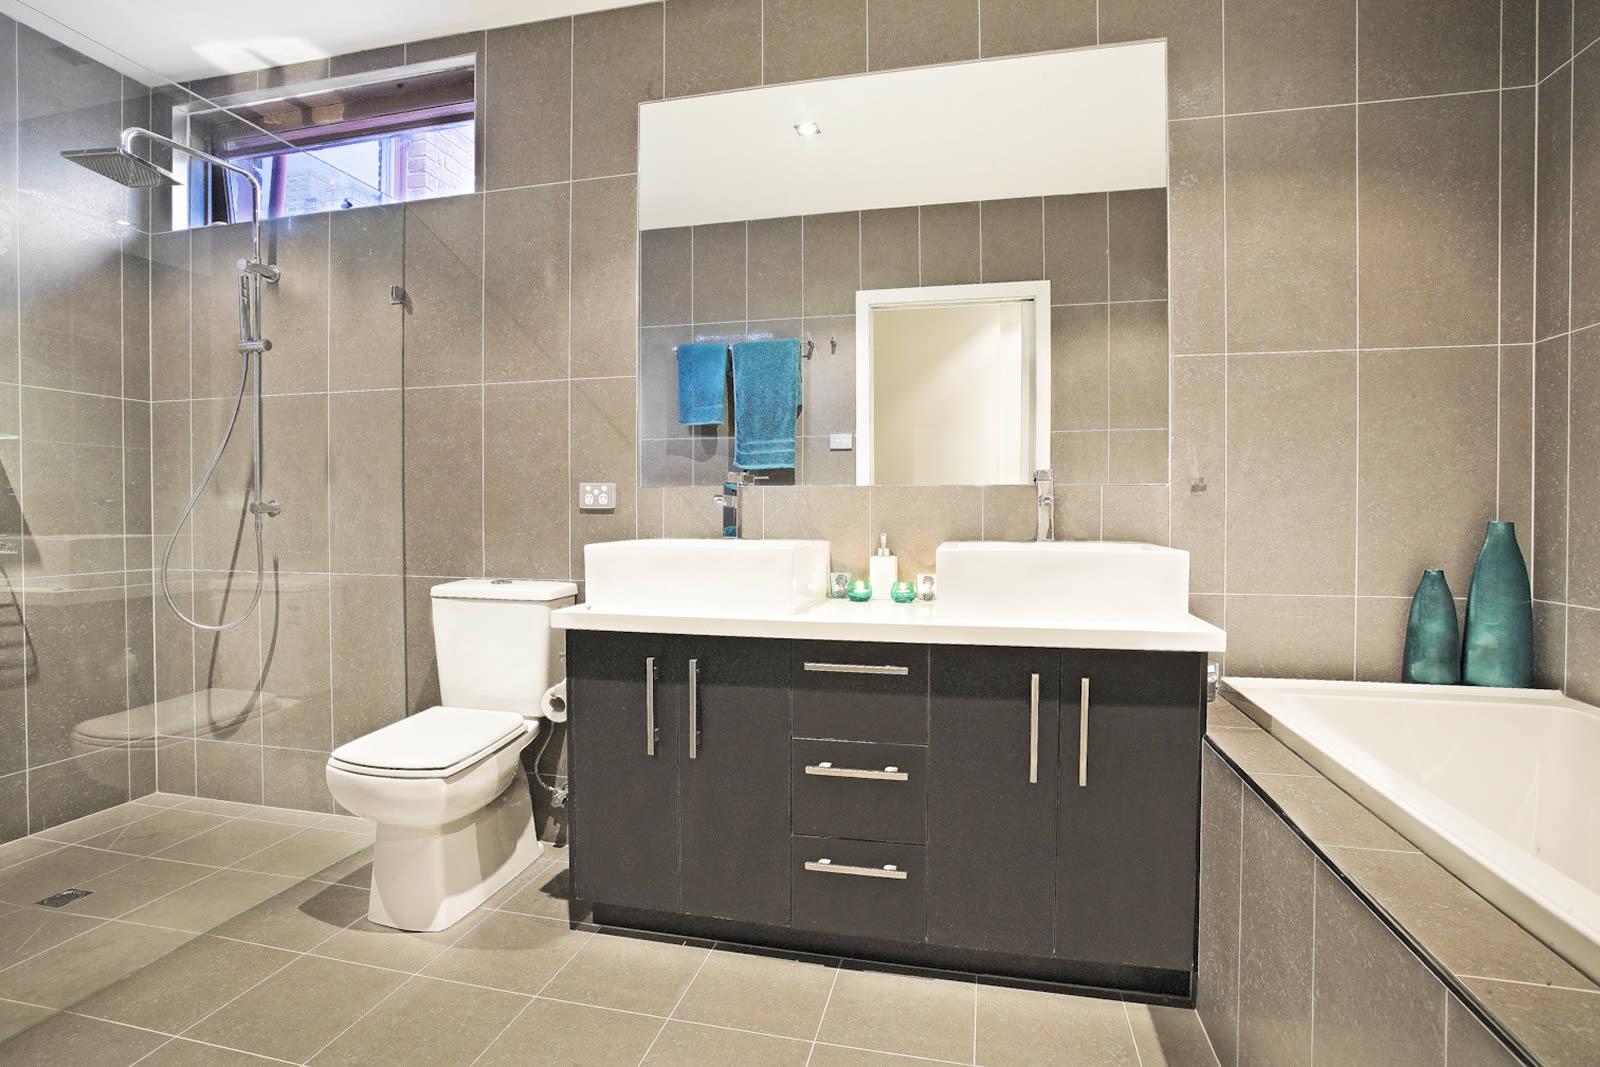 designer bathrooms ... designs of bathrooms home design ideas for designed intricate ... LBWBZXW